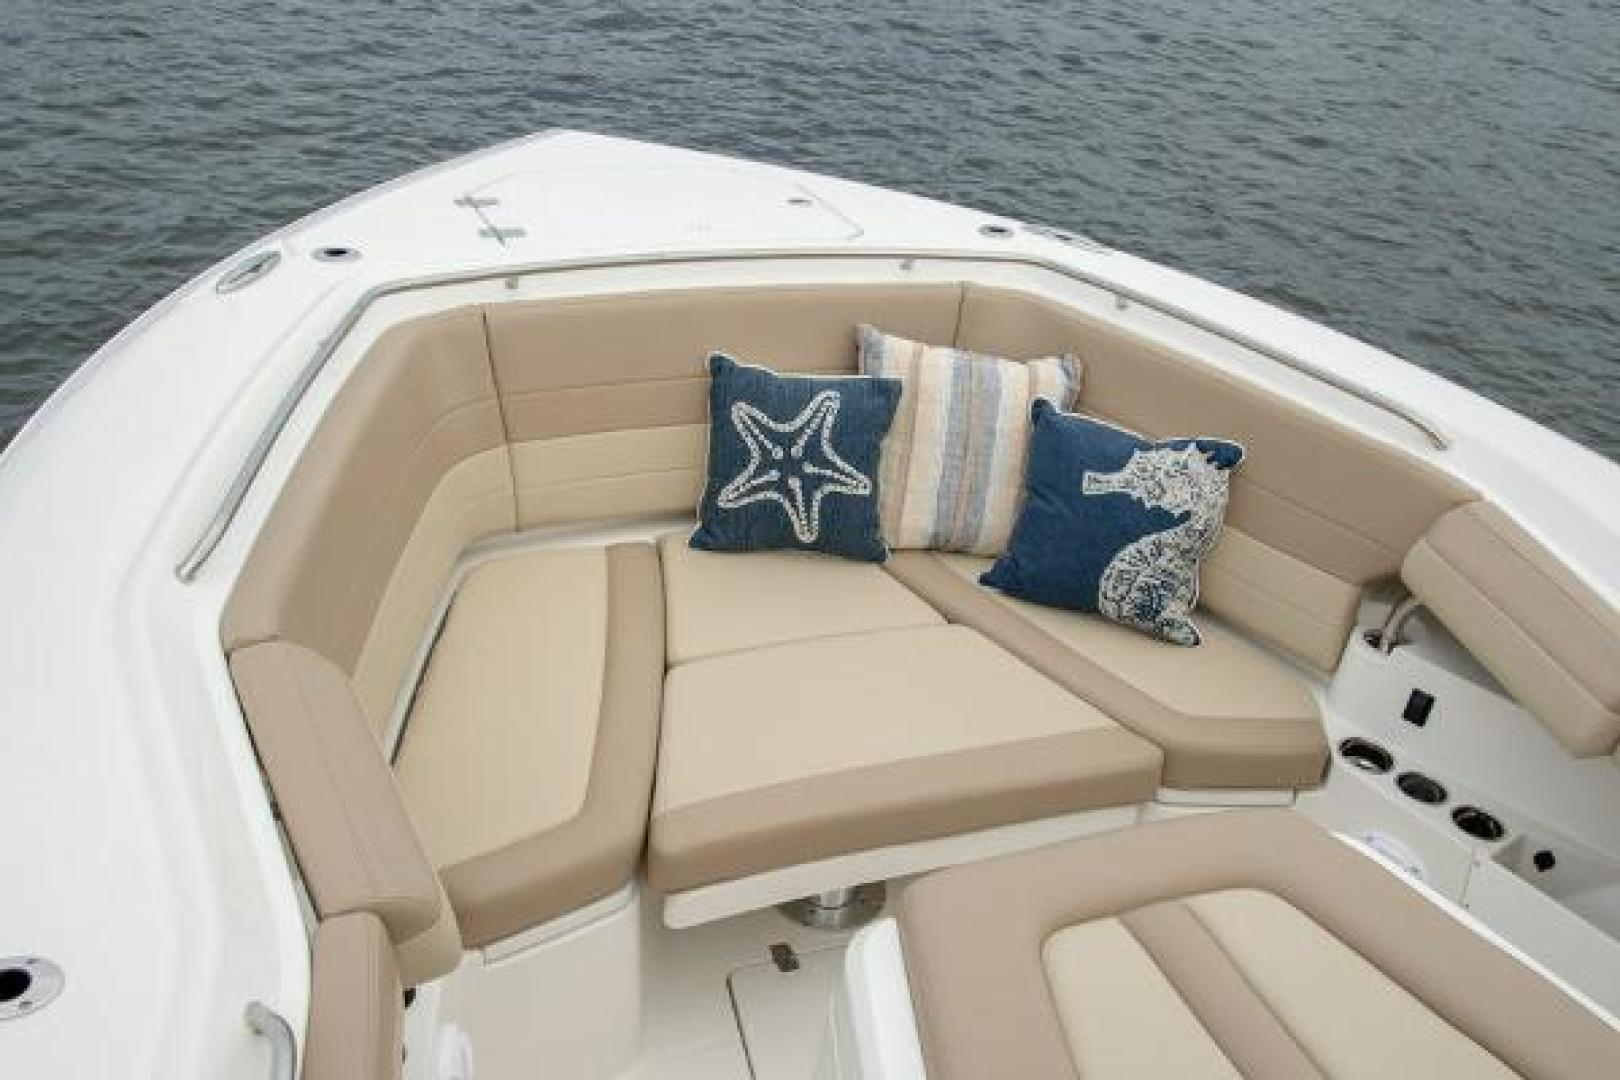 Sailfish-360 CC 2021-Sailfish 360 CC Fort Lauderdale-Florida-United States-Manufacturer Provided Image-1524505 | Thumbnail